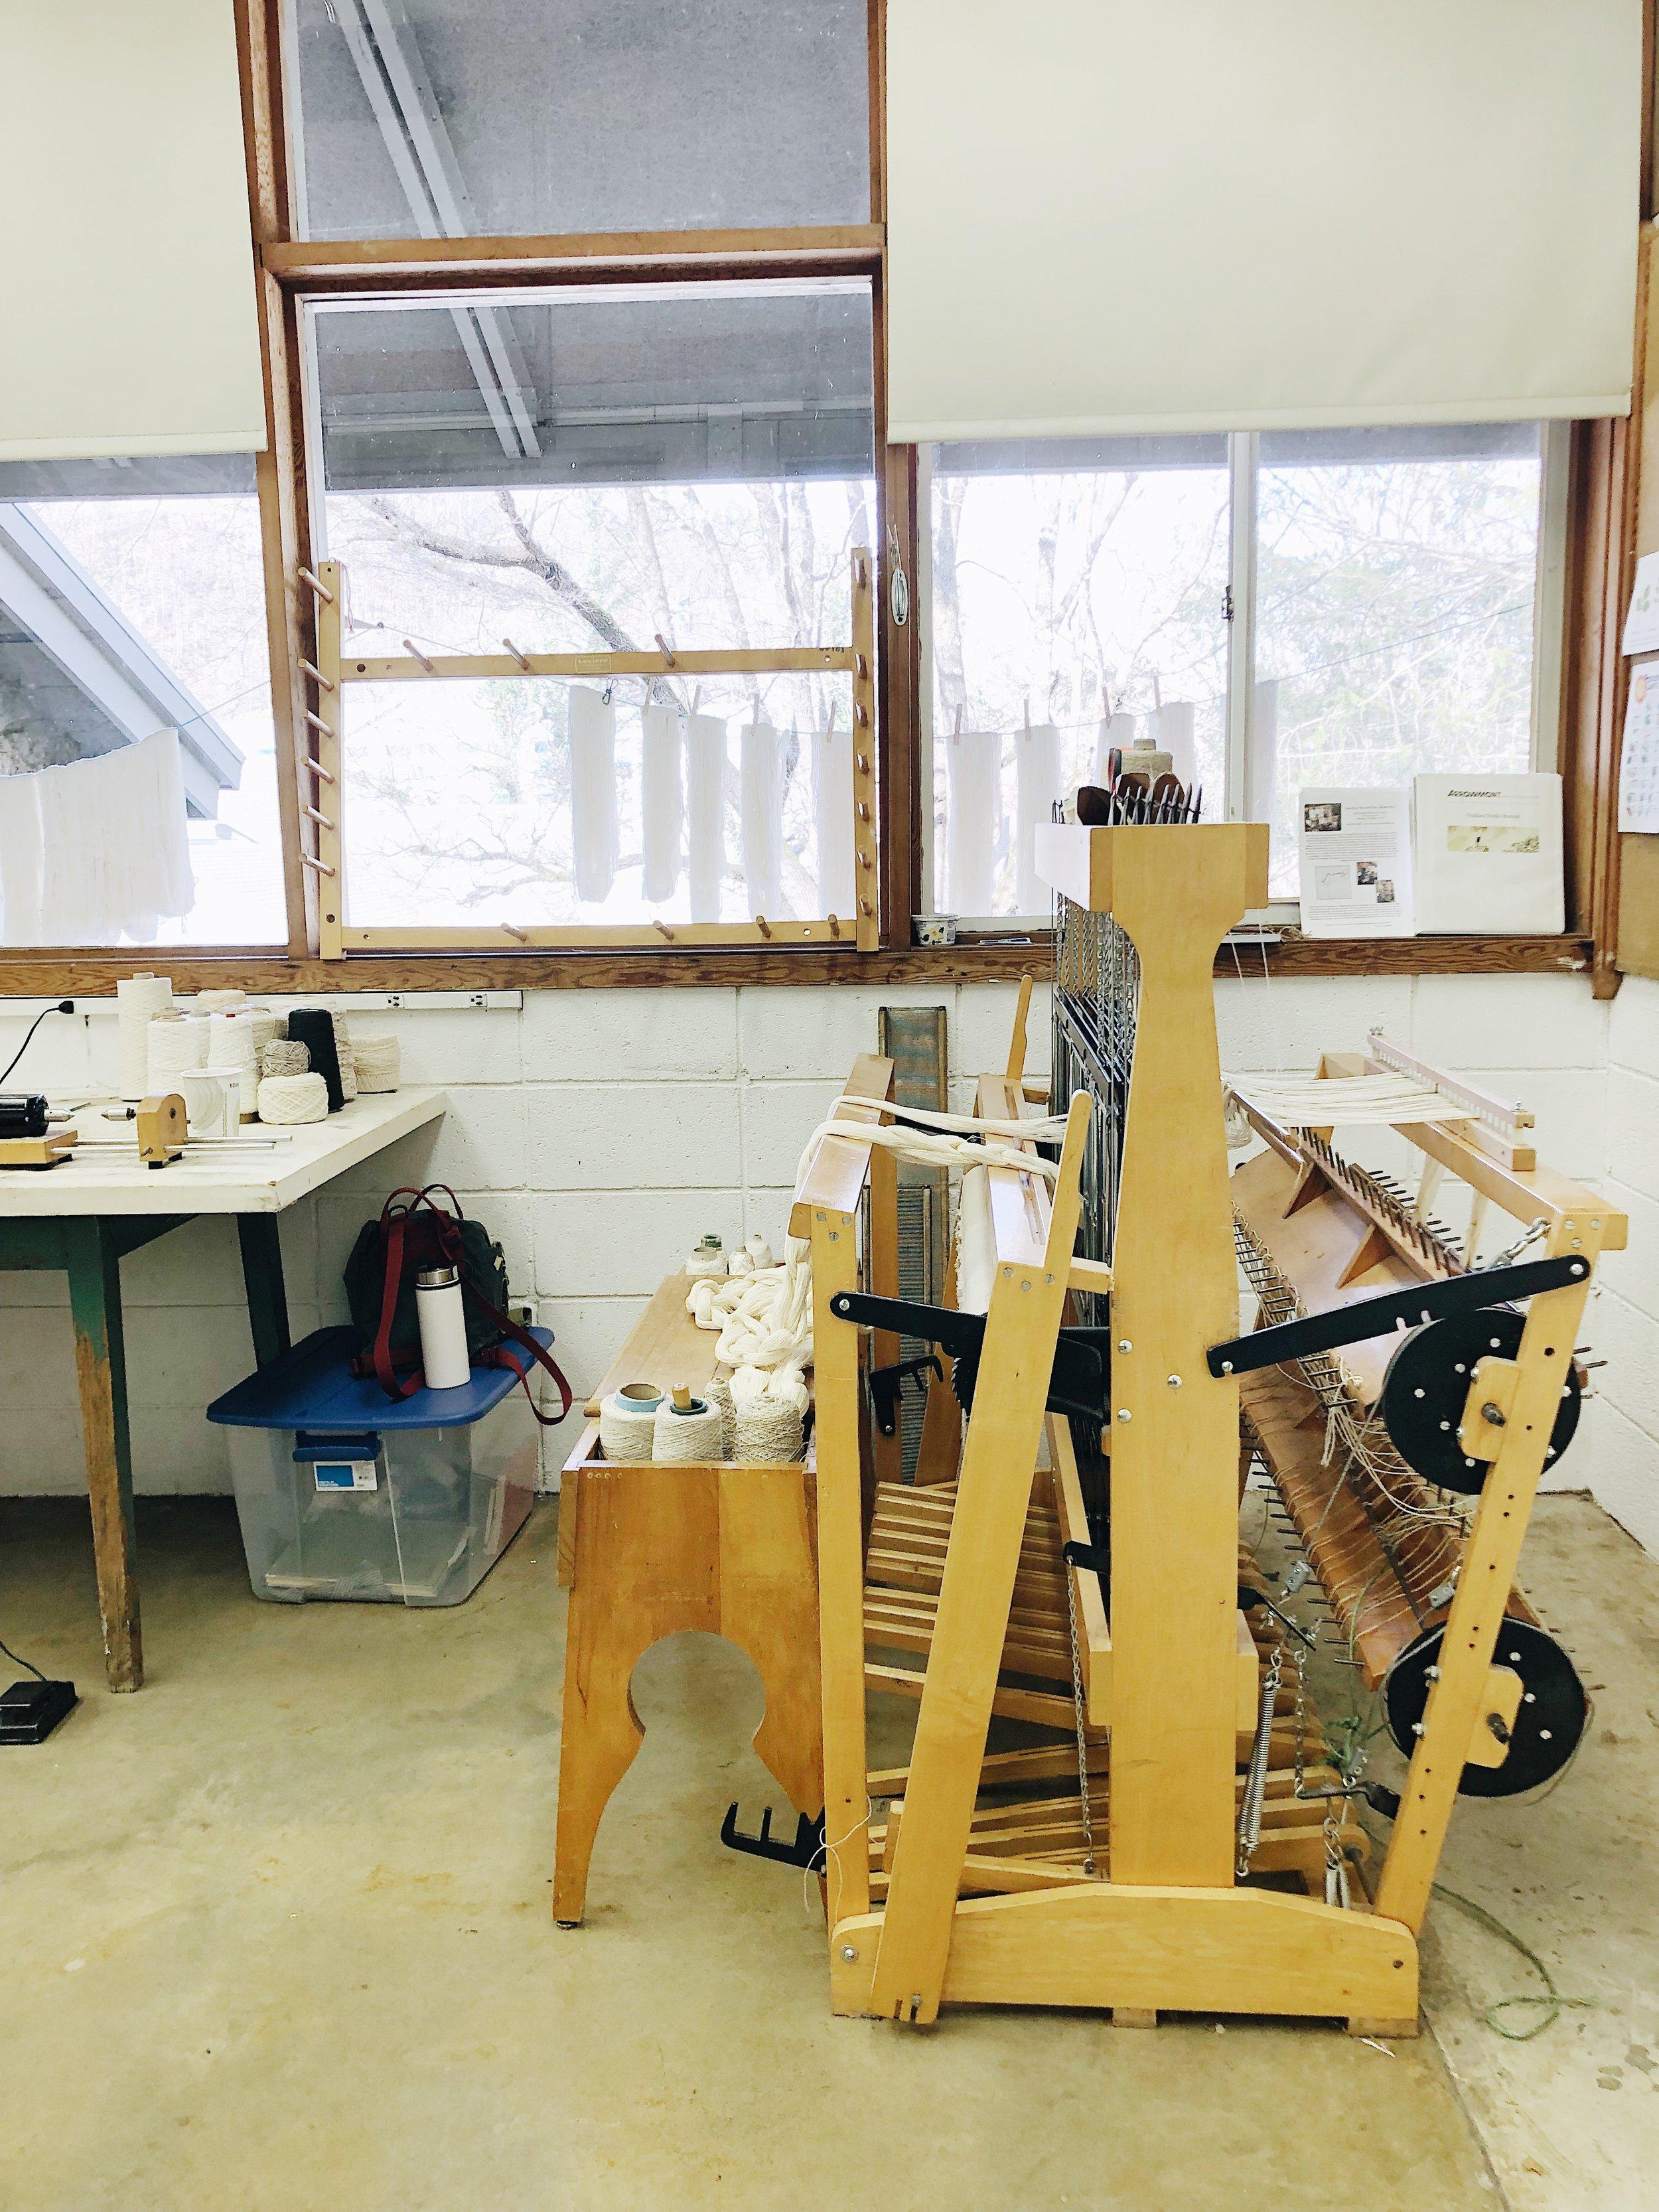 Weaving corner in the fiber studio.